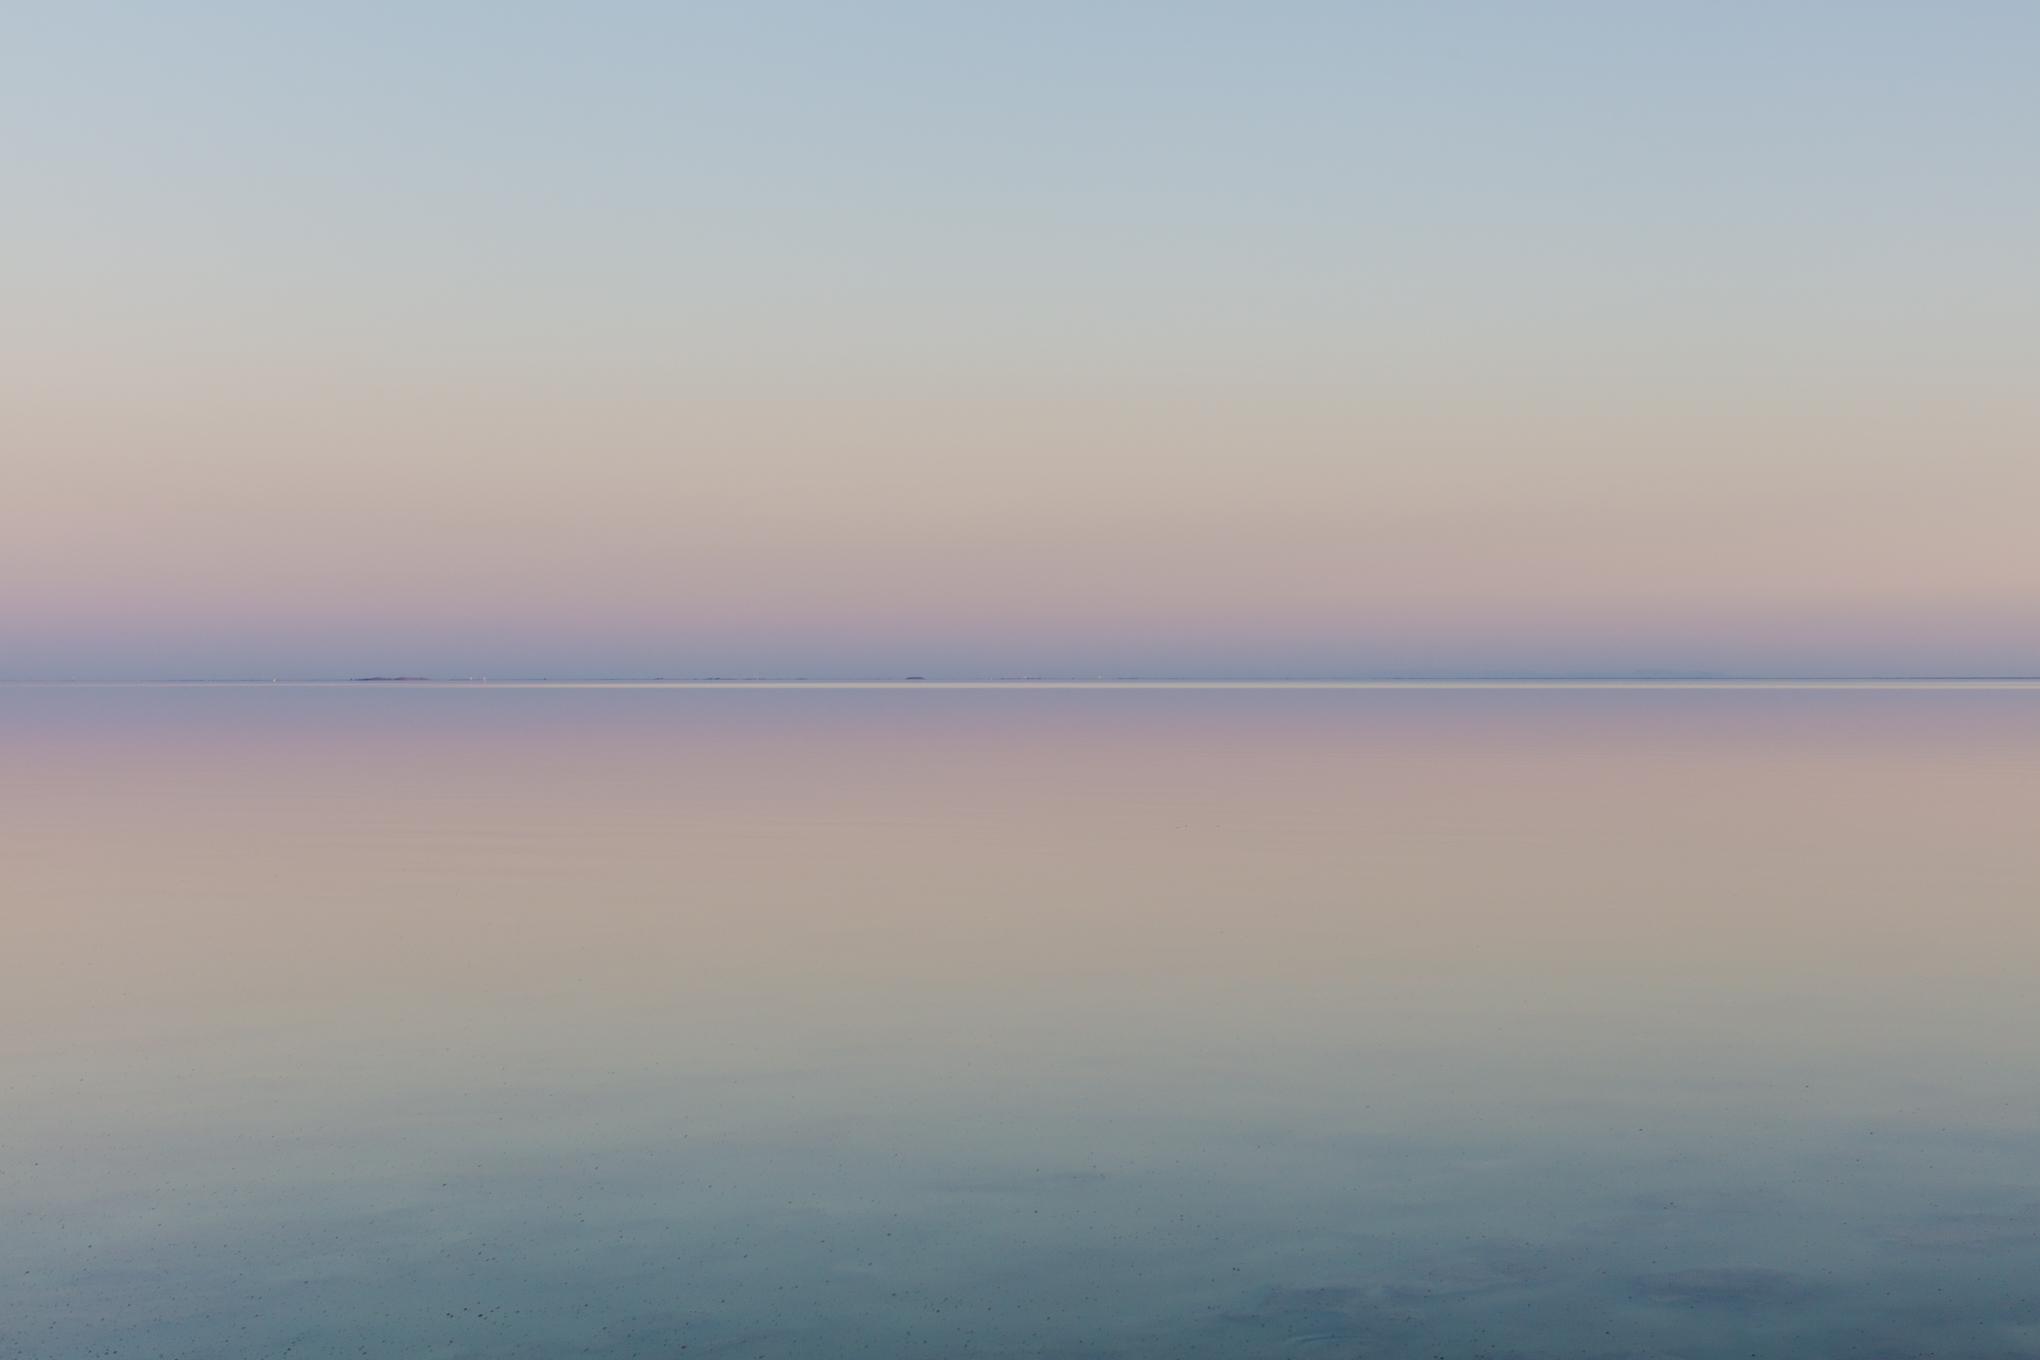 06.01.18_The Verge__Salton Sea_0761.jpg